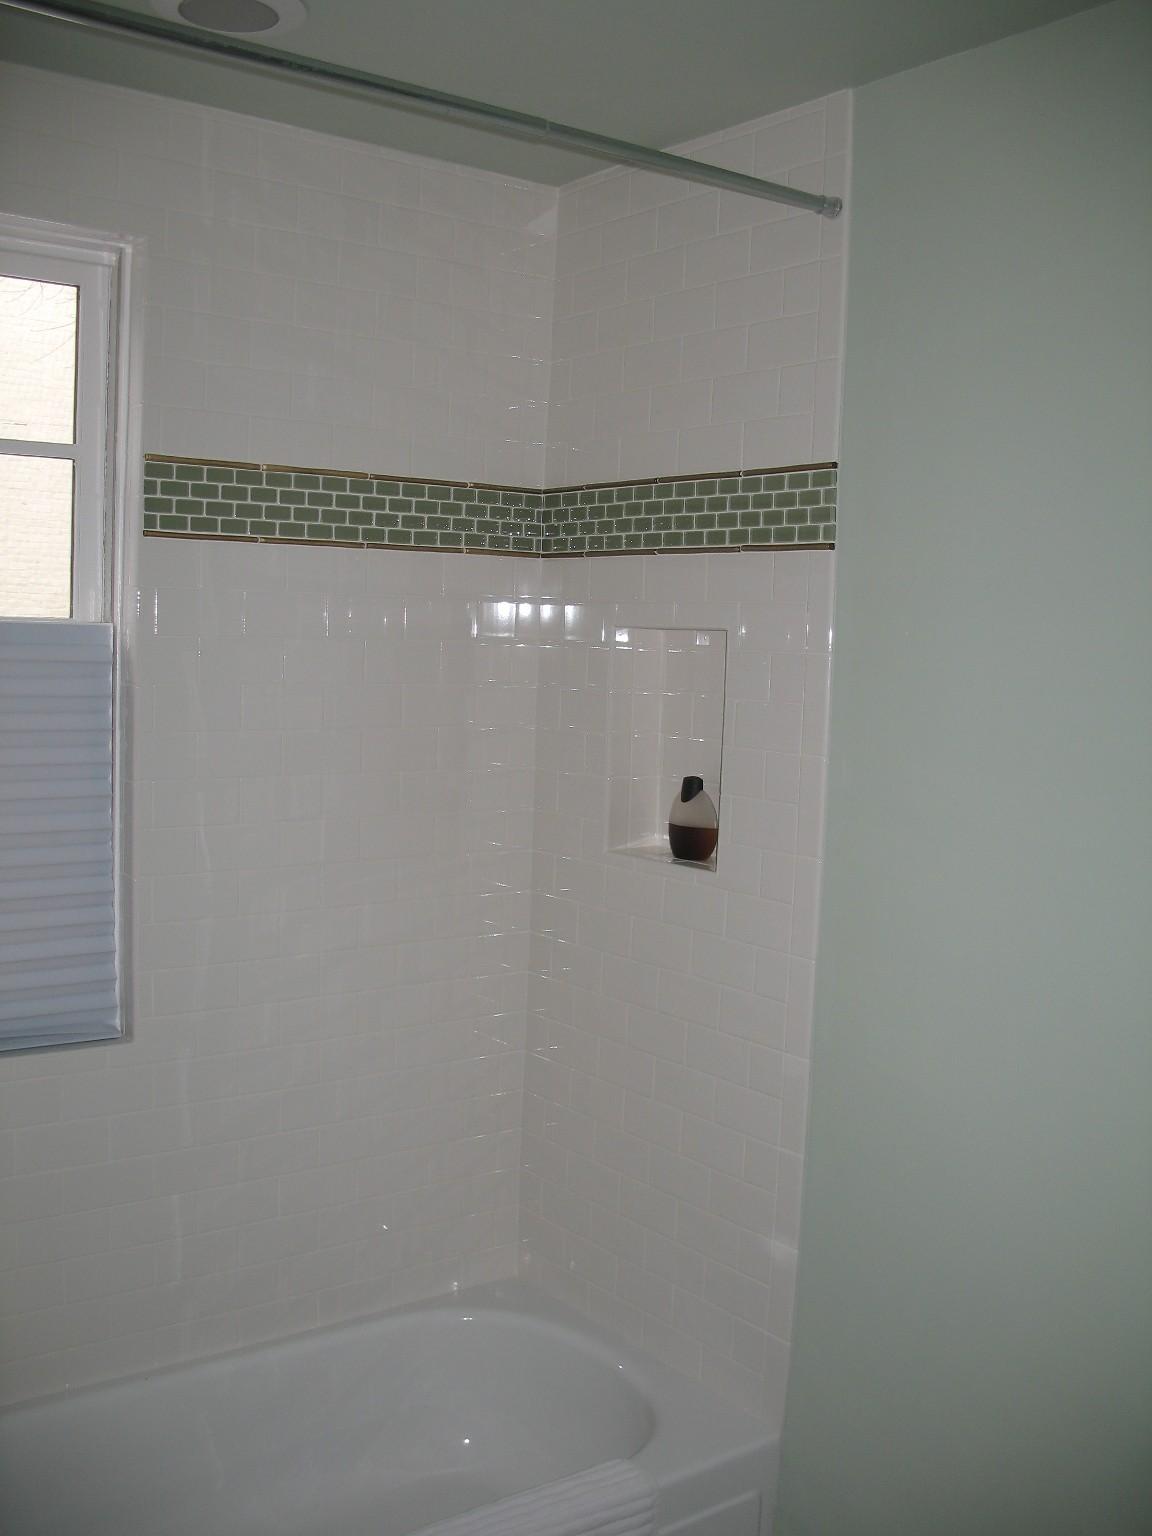 Adventures in creating bathroom reno pt 1 for How to reno a bathroom